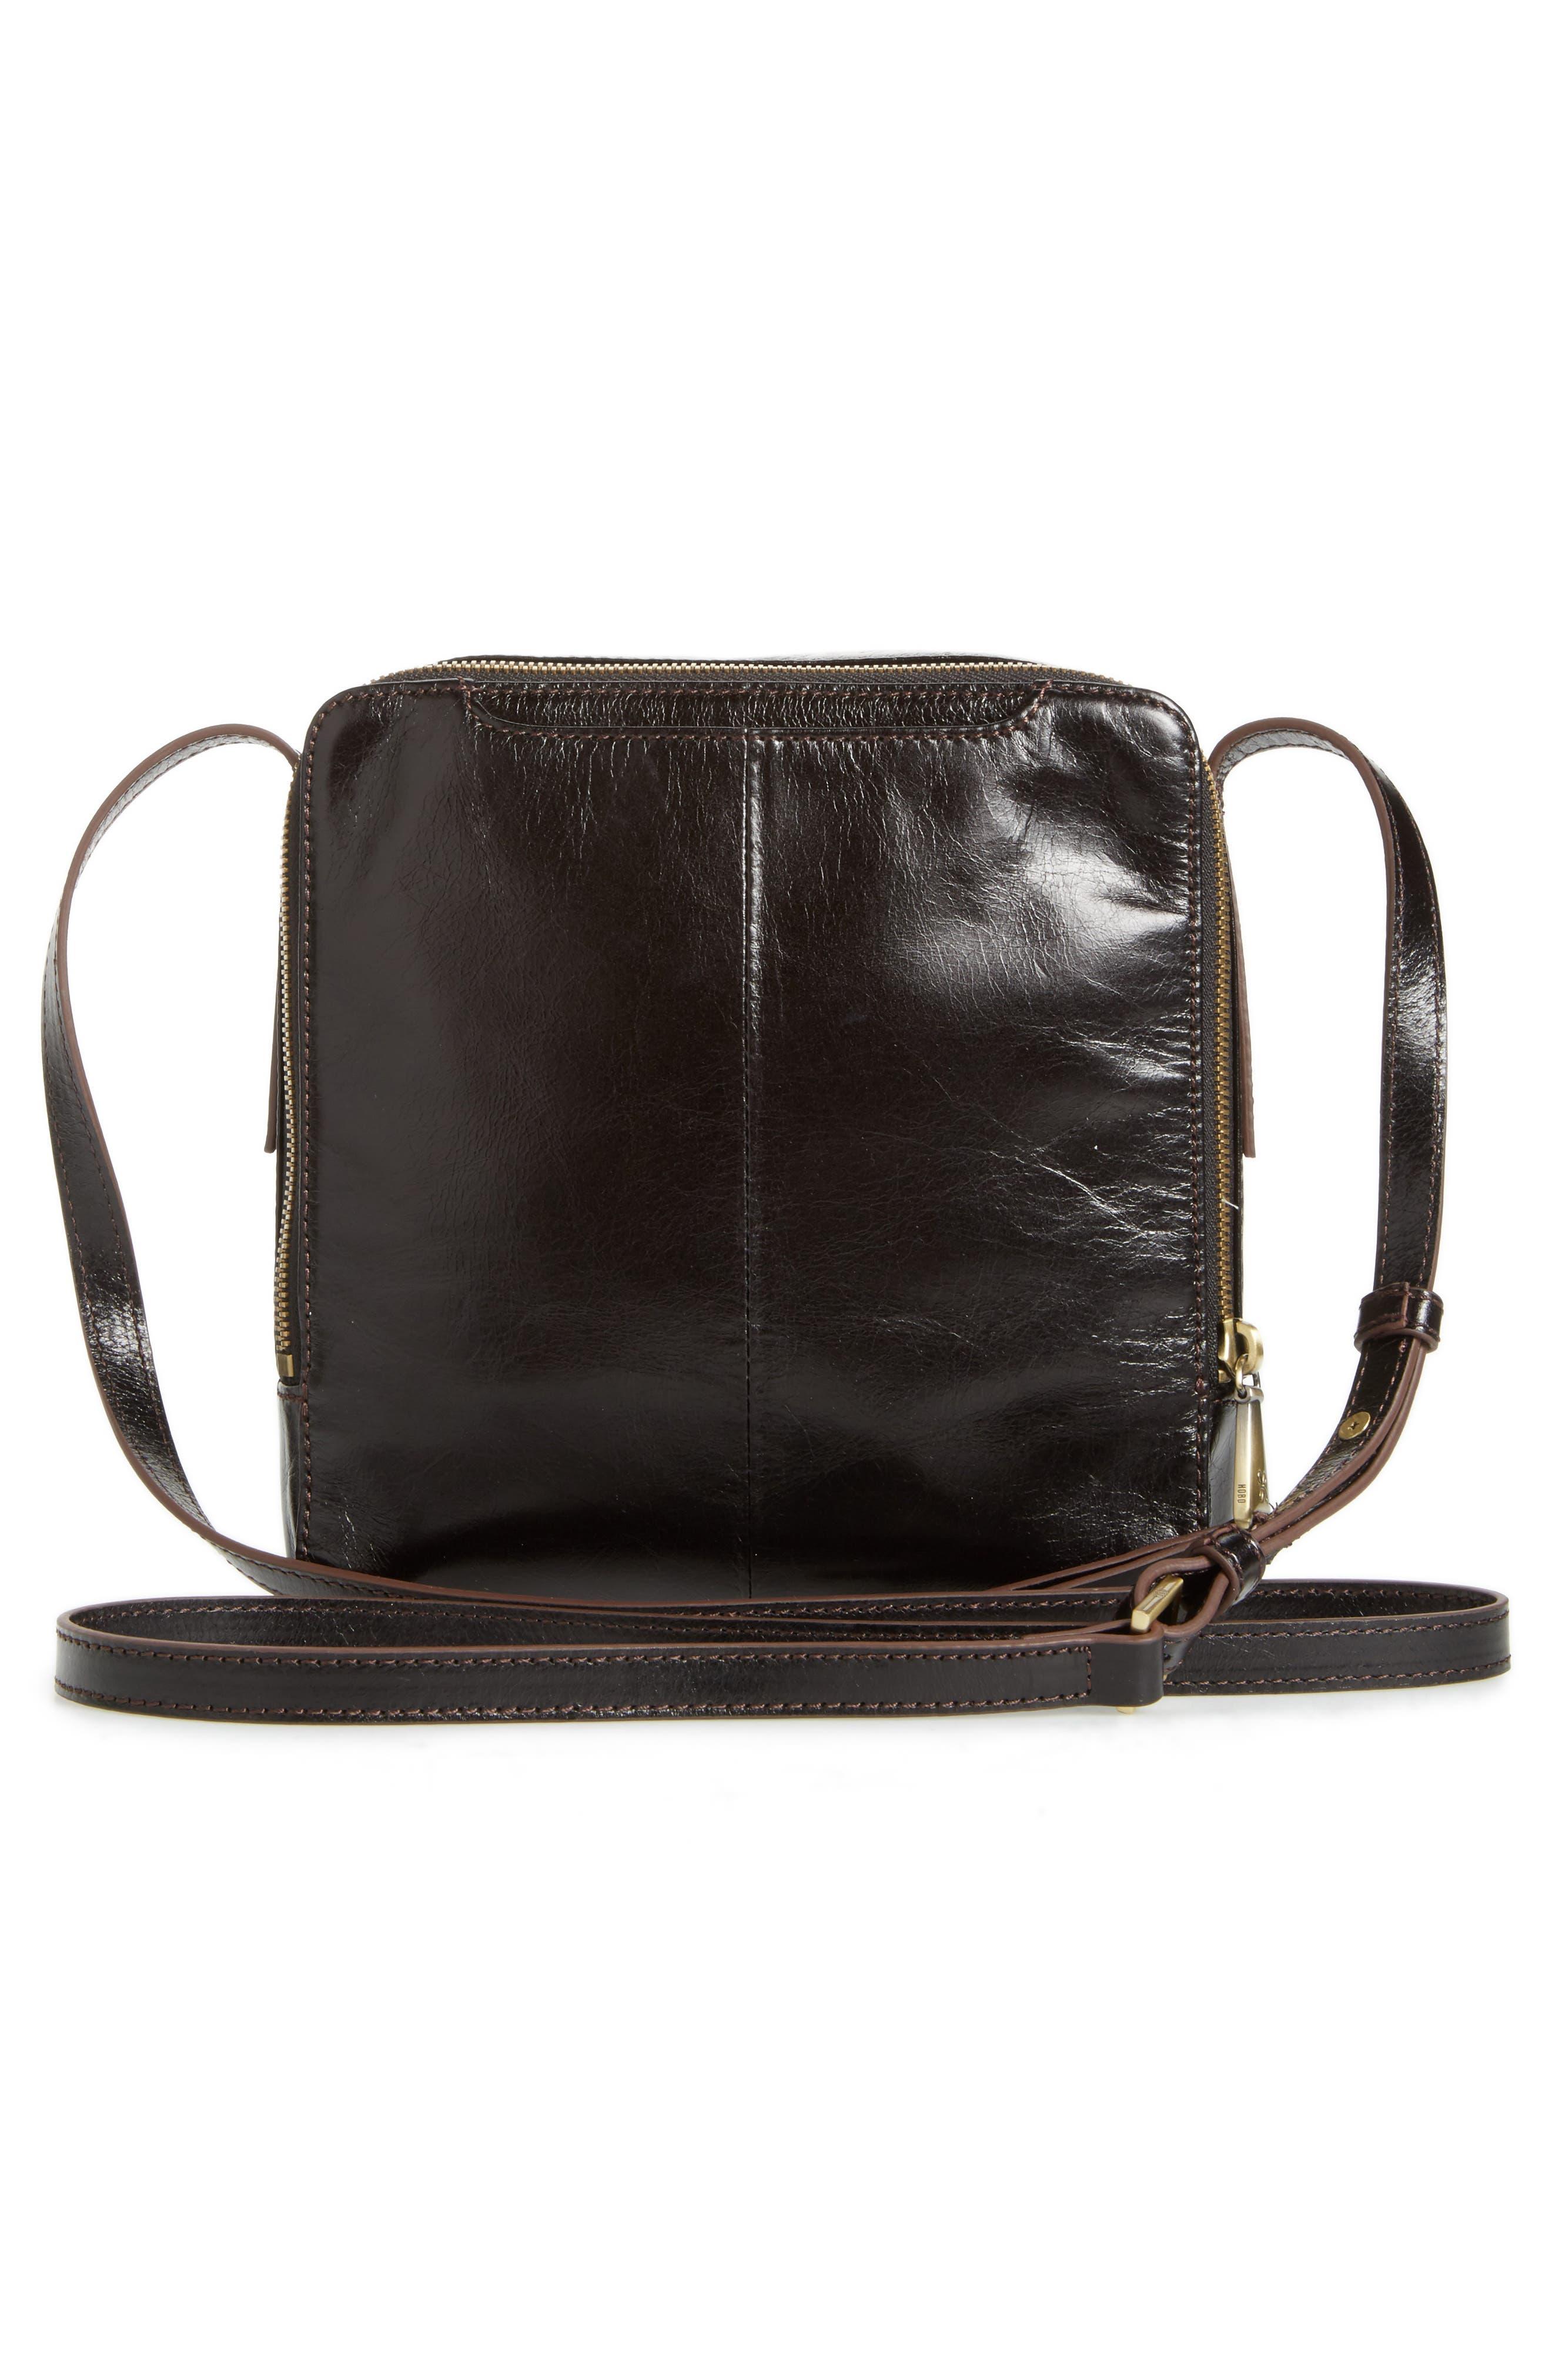 Lyric Leather Crossbody Bag,                             Alternate thumbnail 3, color,                             001